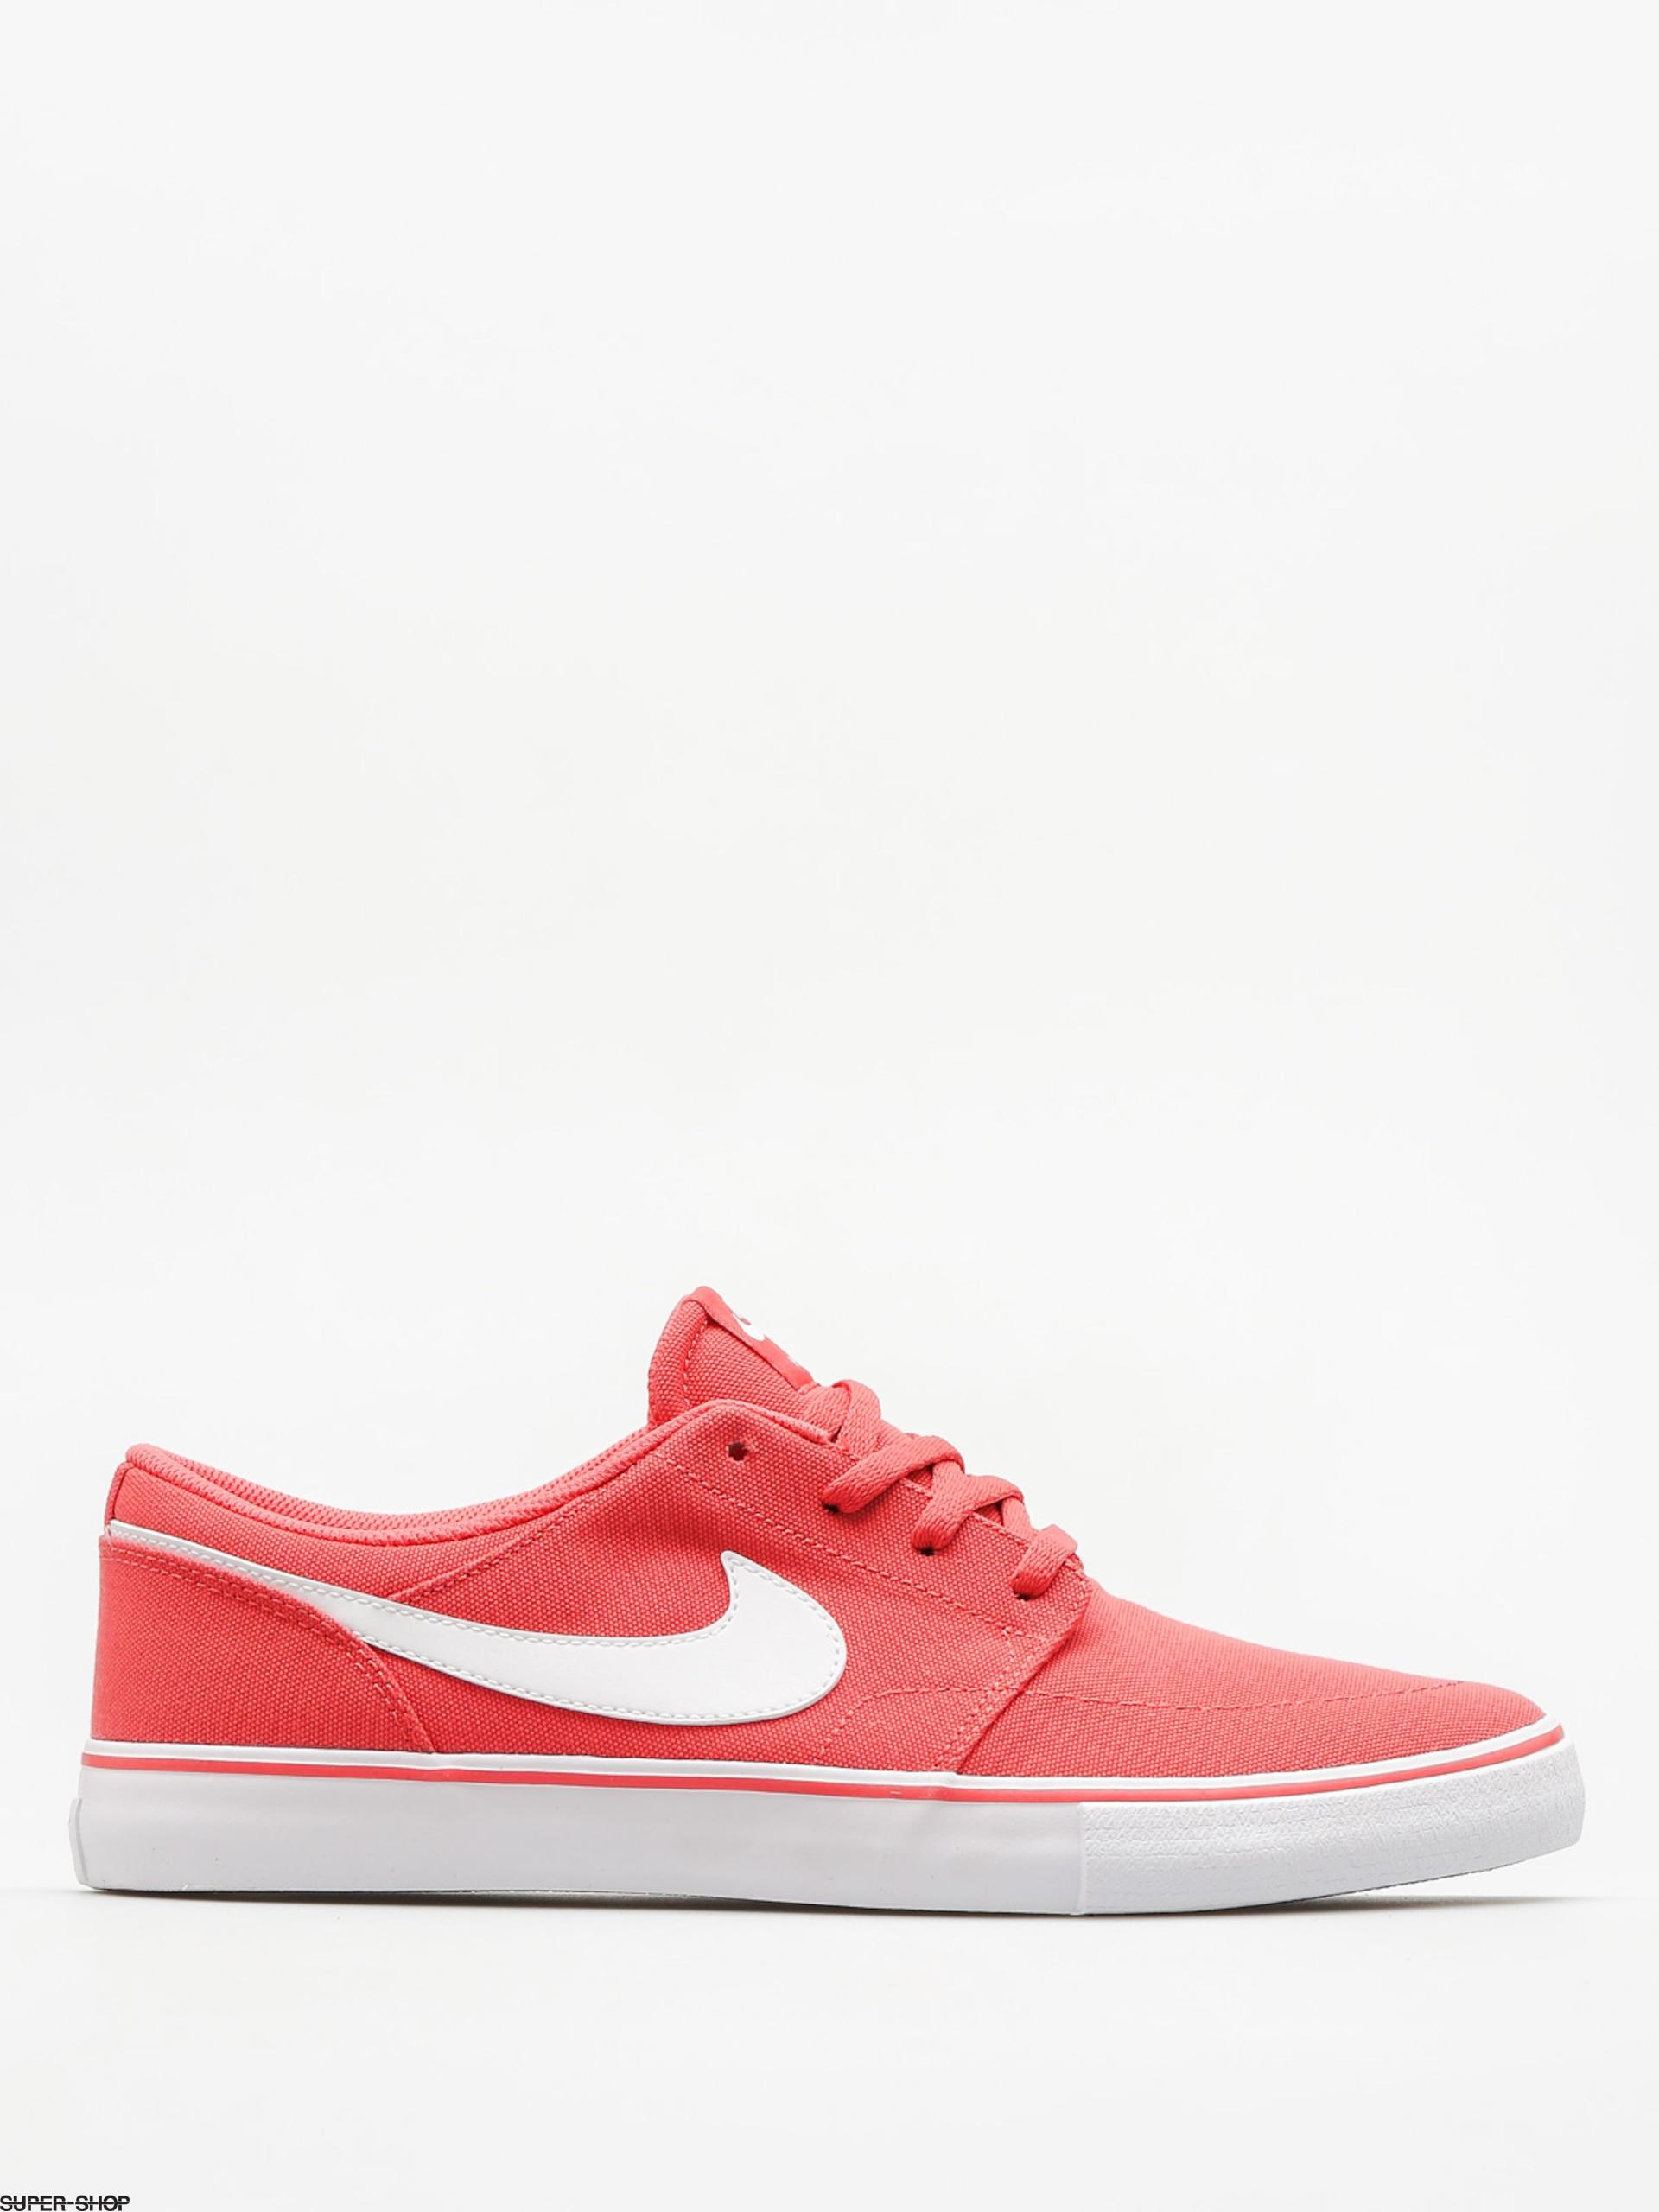 Solar Redwhite Sb Portmore Cnvstrack Black Schuhe Nike Ii VMpzqSU